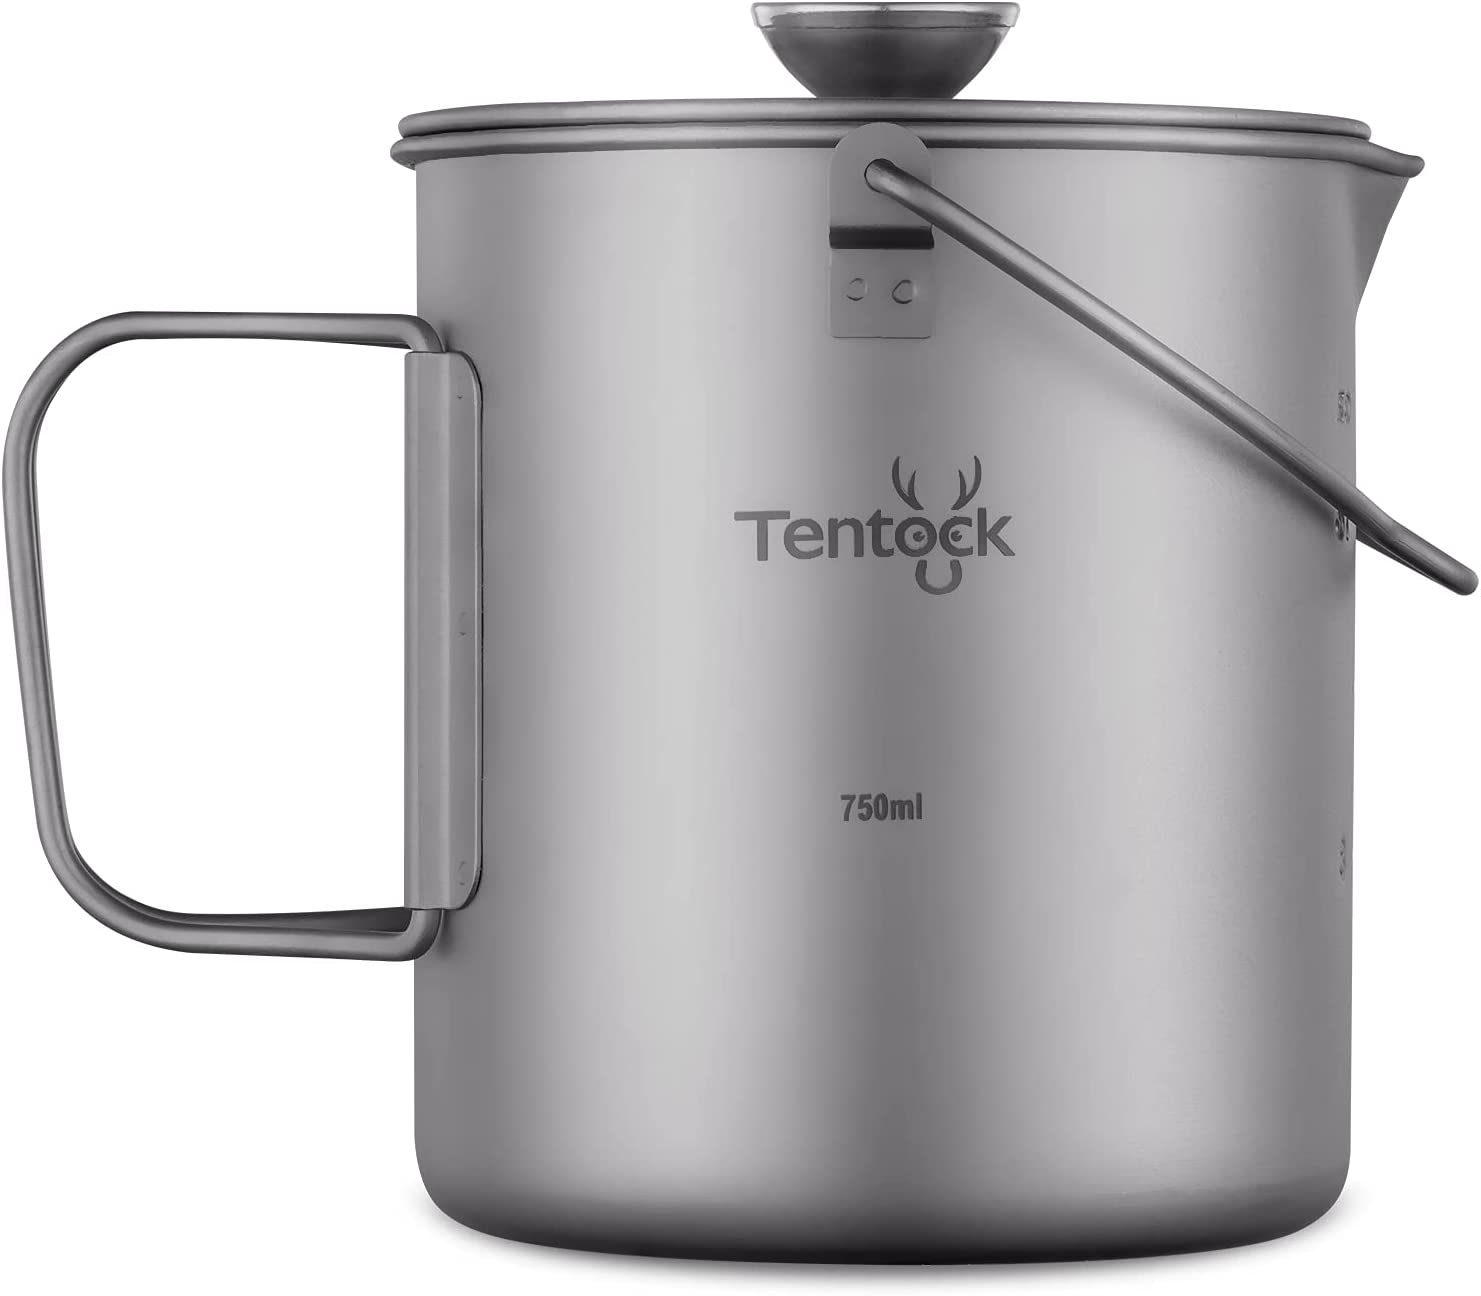 Tentock Titanium Cup Camping Coffee Maker French Tampa Mall Max 60% OFF Pr Mug